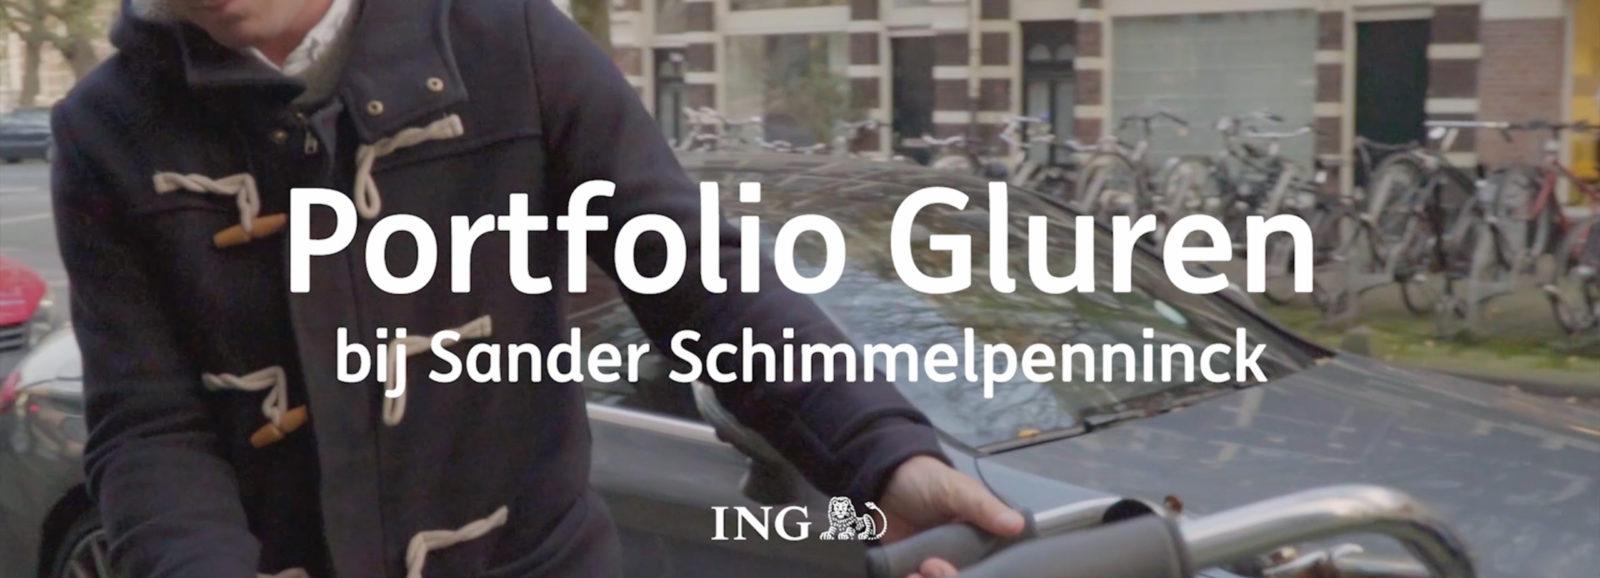 ING - Portfolio Gluren